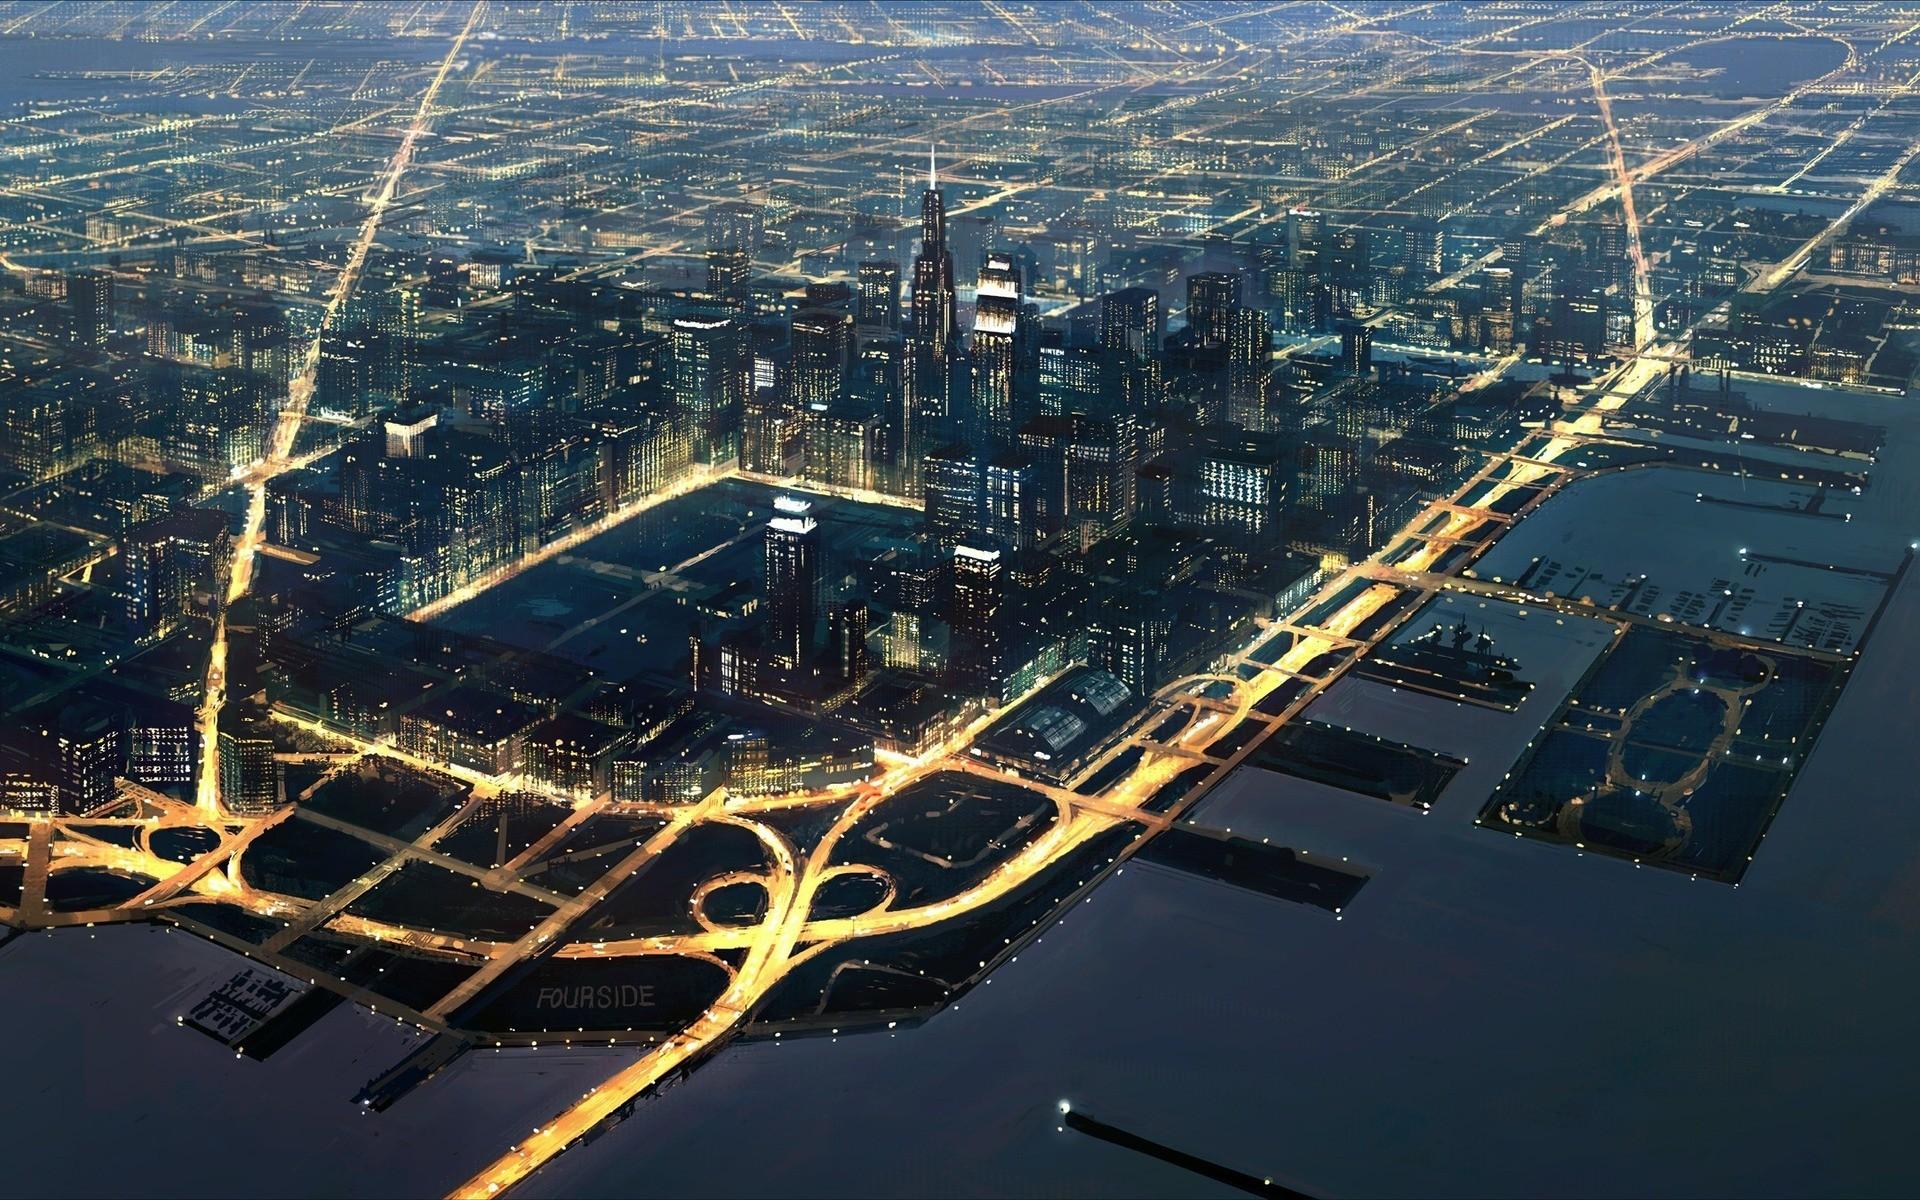 General 1920x1200 cityscape artwork road building architecture sea lights long exposure